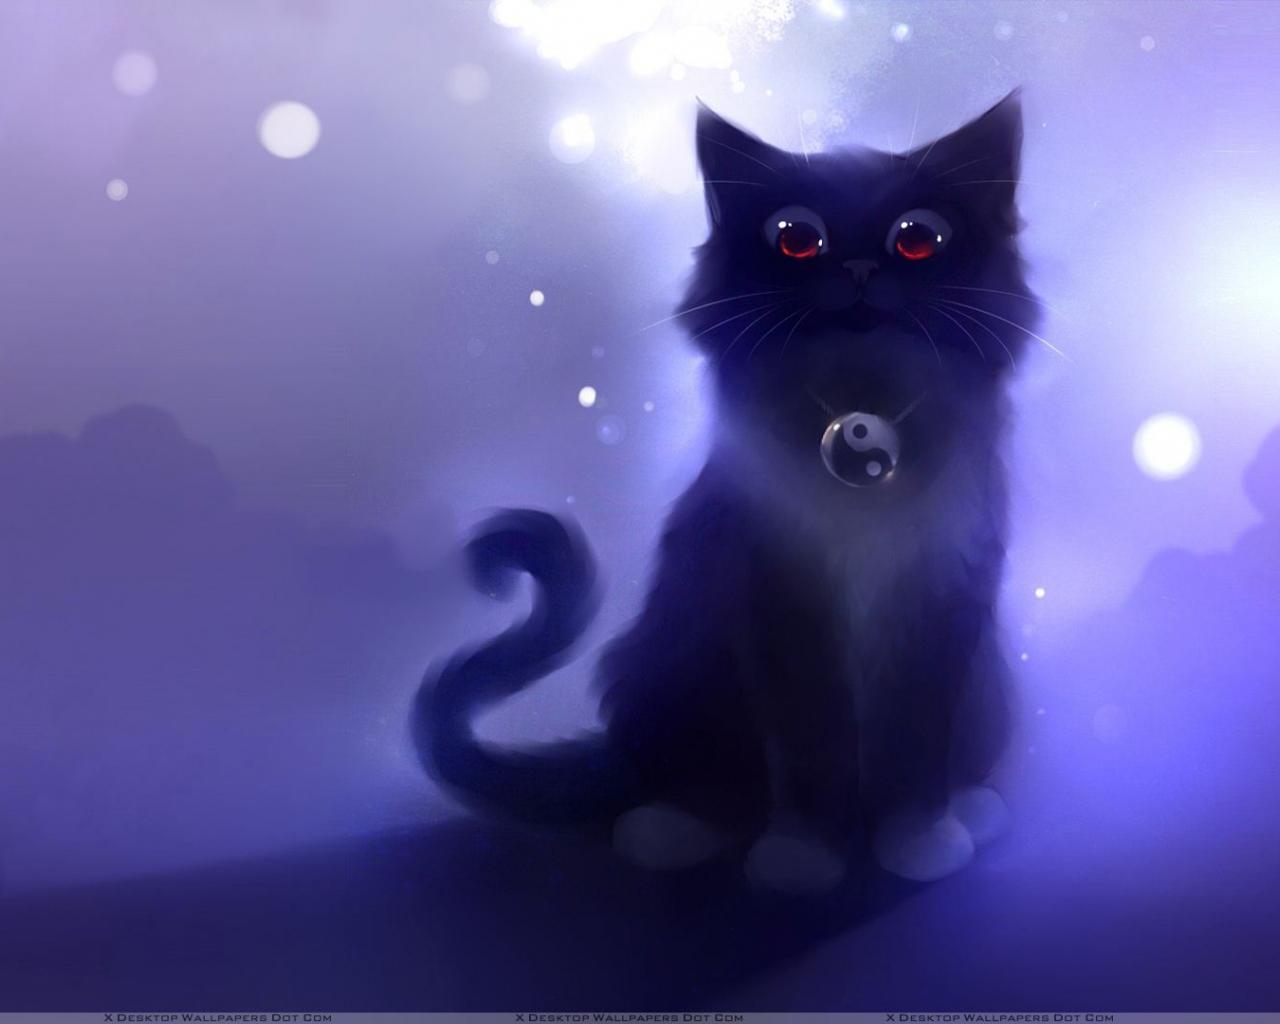 Free Download Cartoon Black Cat Sitting Wallpaper 1920x1080 For